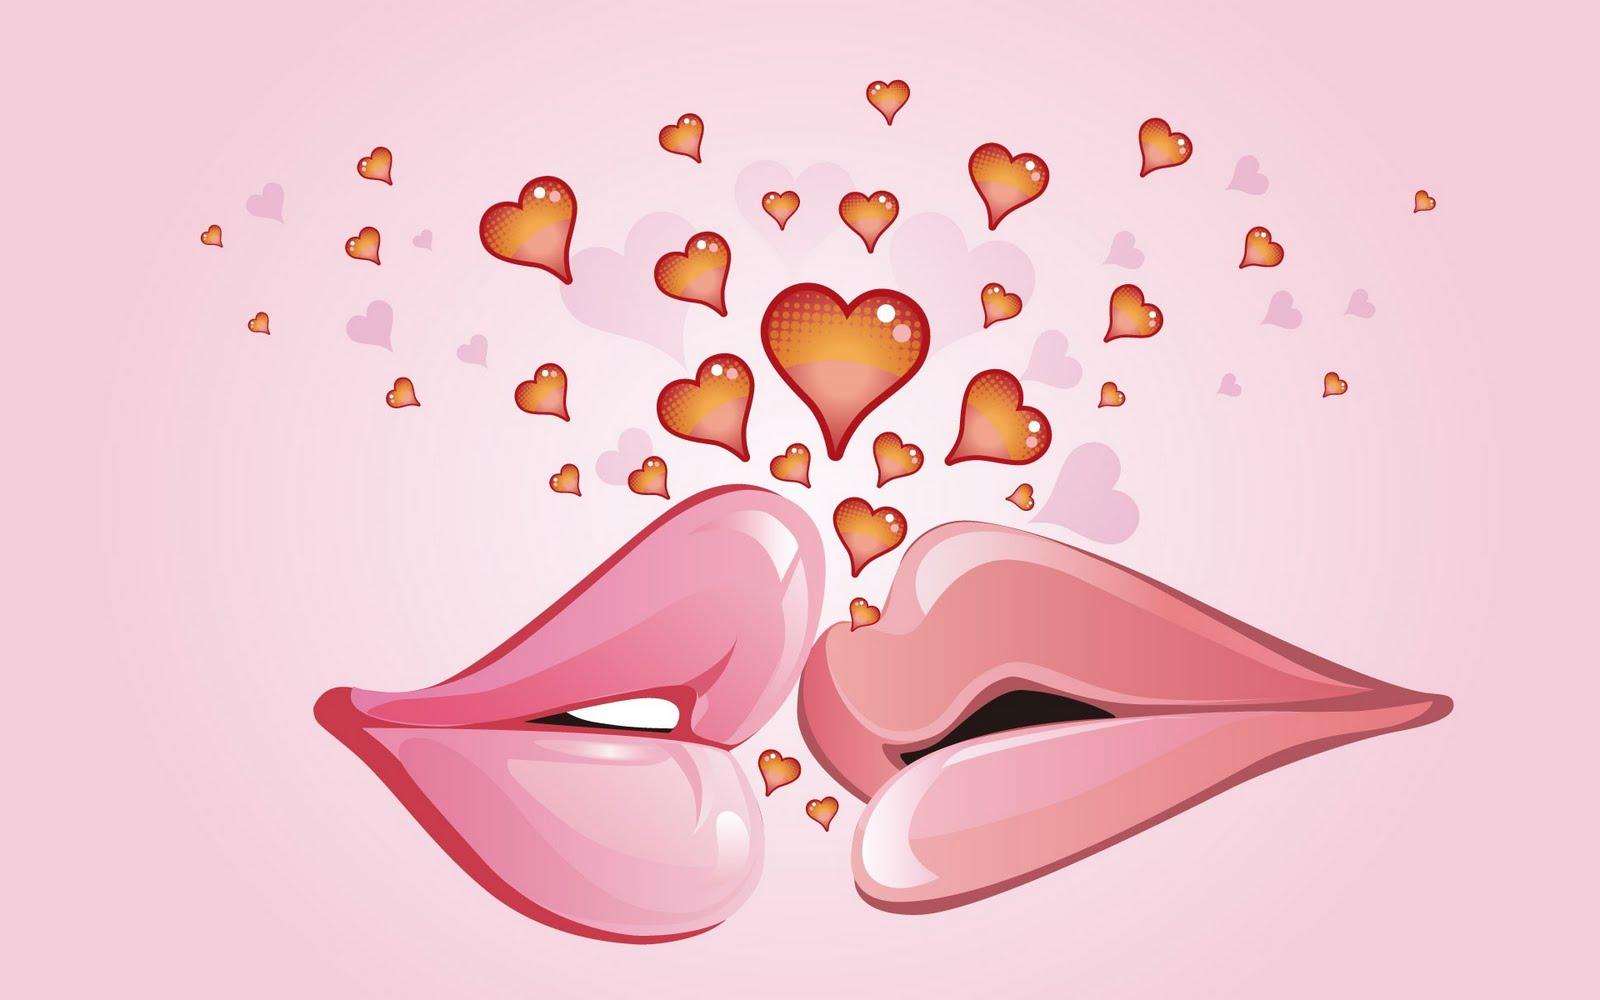 http://1.bp.blogspot.com/-cRN-yyHNAwA/TcLyZpjiAFI/AAAAAAAAApk/Rg-zwnGYHnM/s1600/Lips_dudak_1.jpg